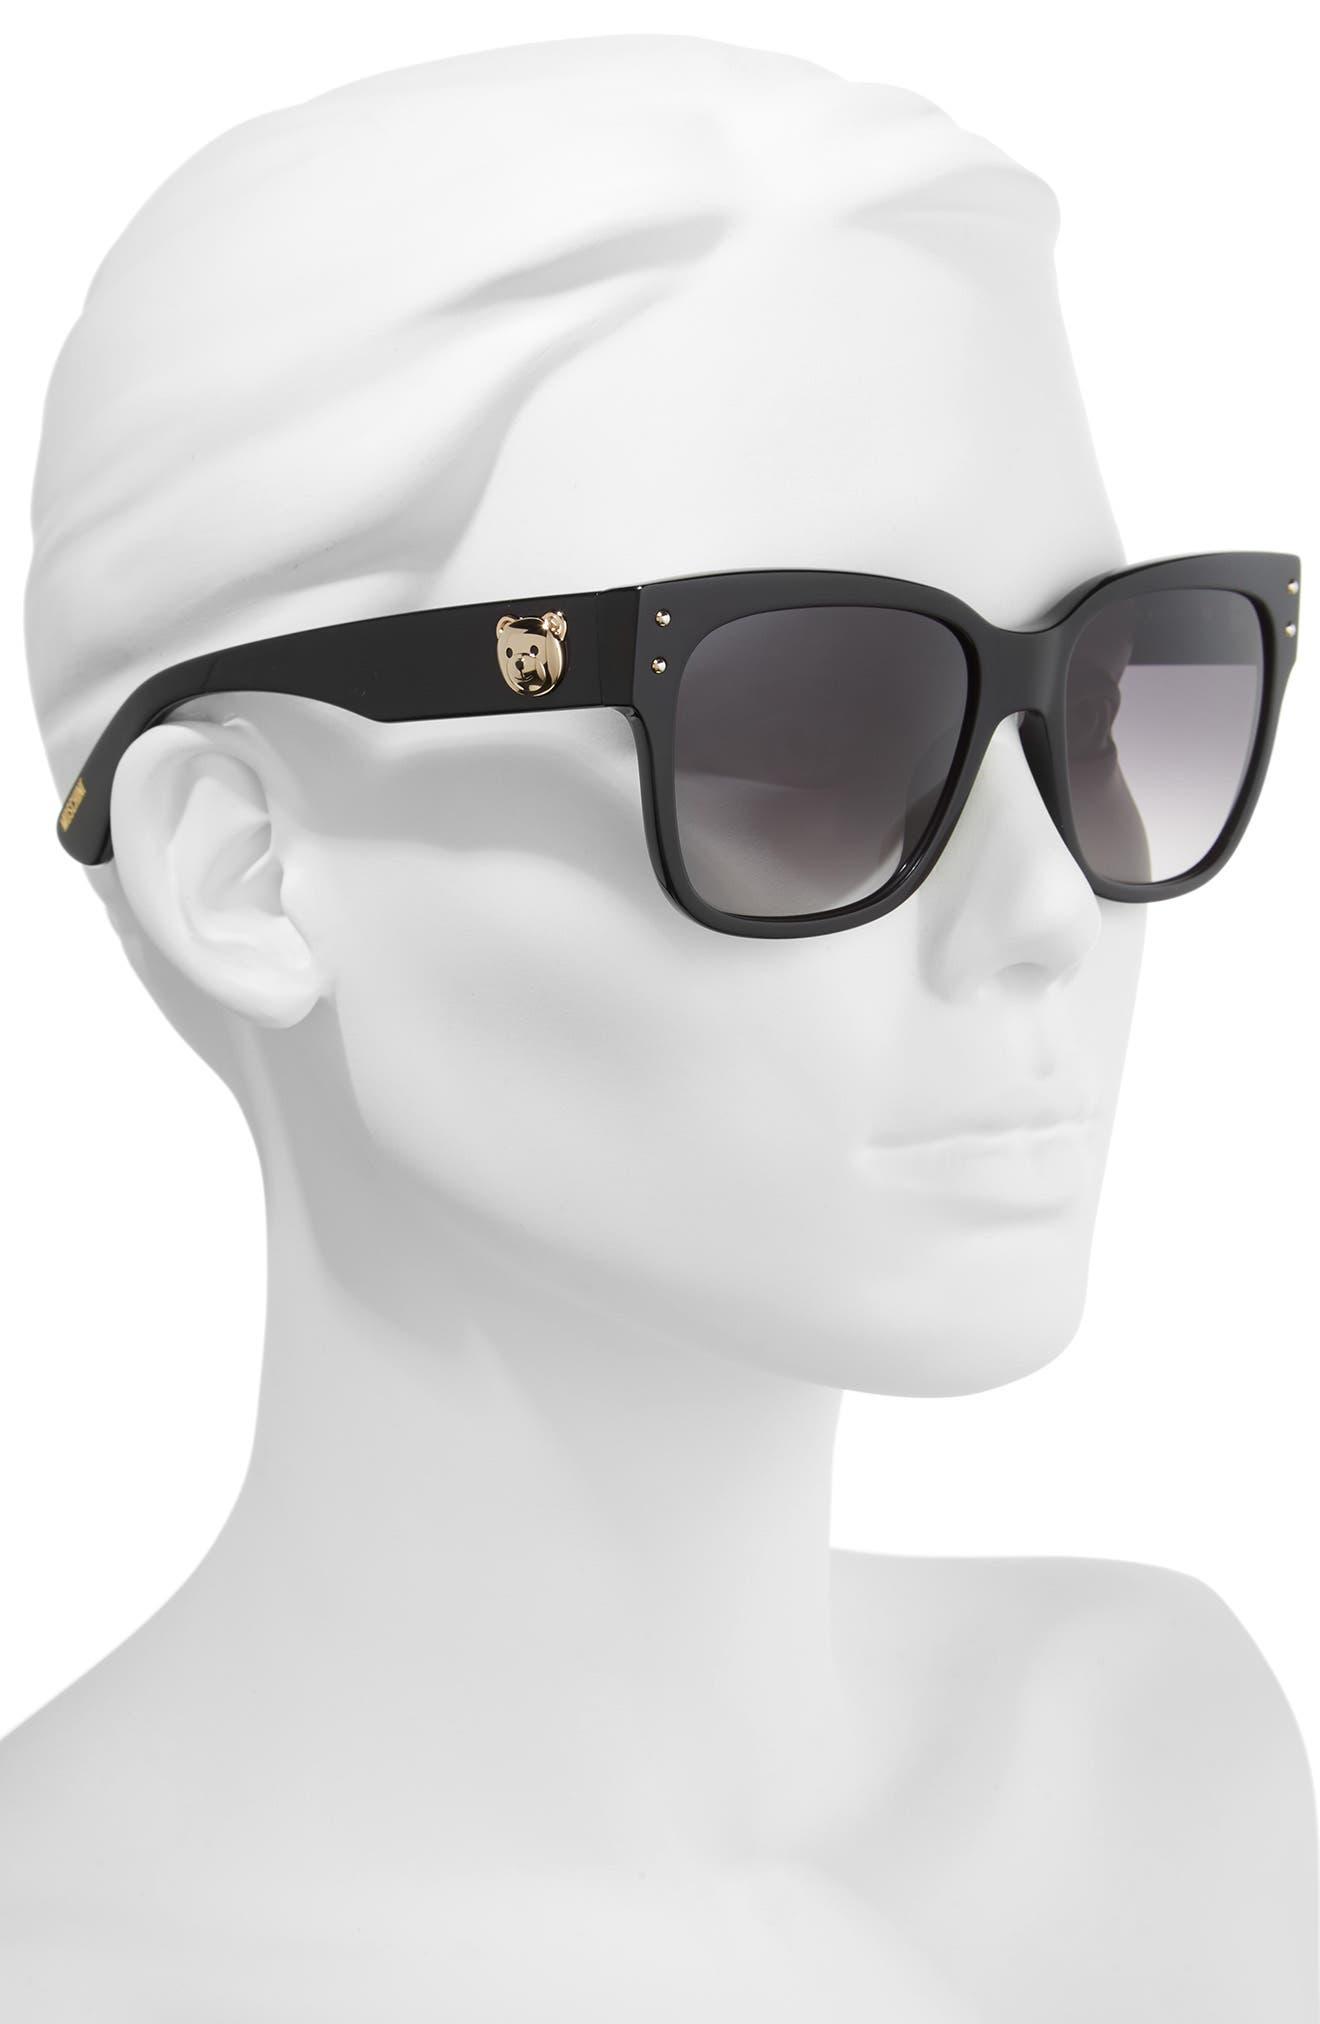 56mm Gradient Lens Sunglasses,                             Alternate thumbnail 2, color,                             BLACK